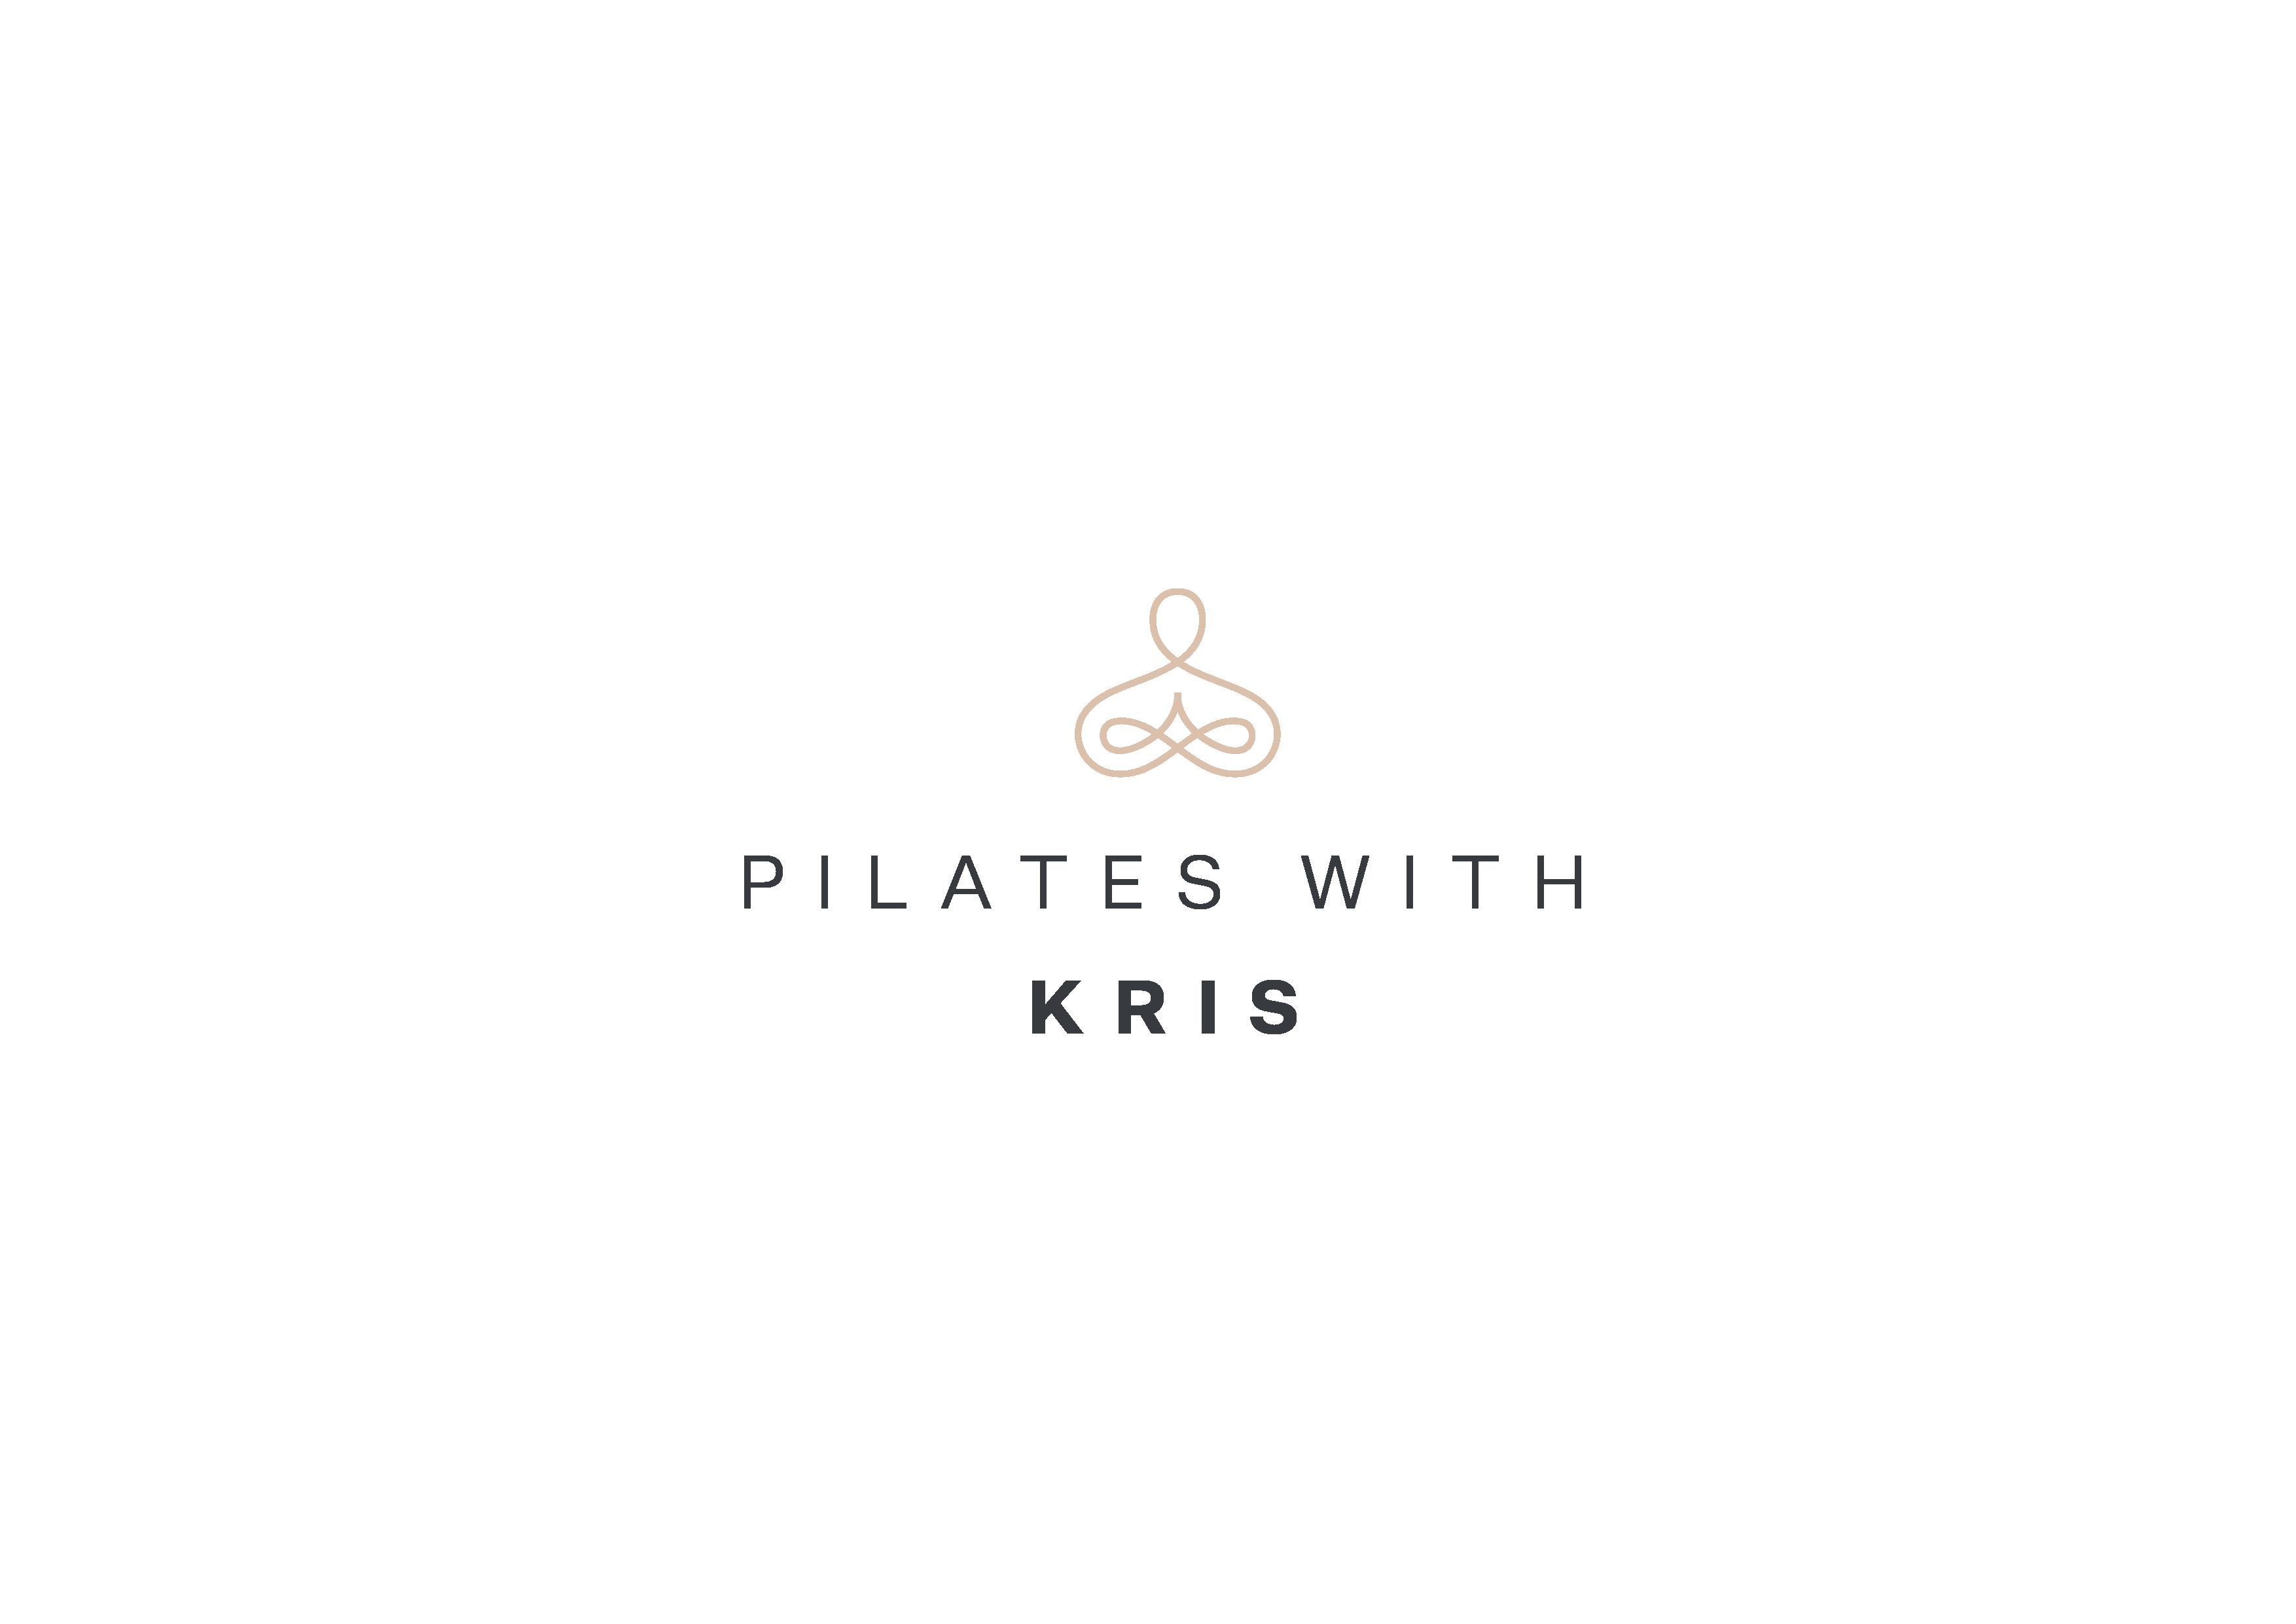 Pilates with Kris